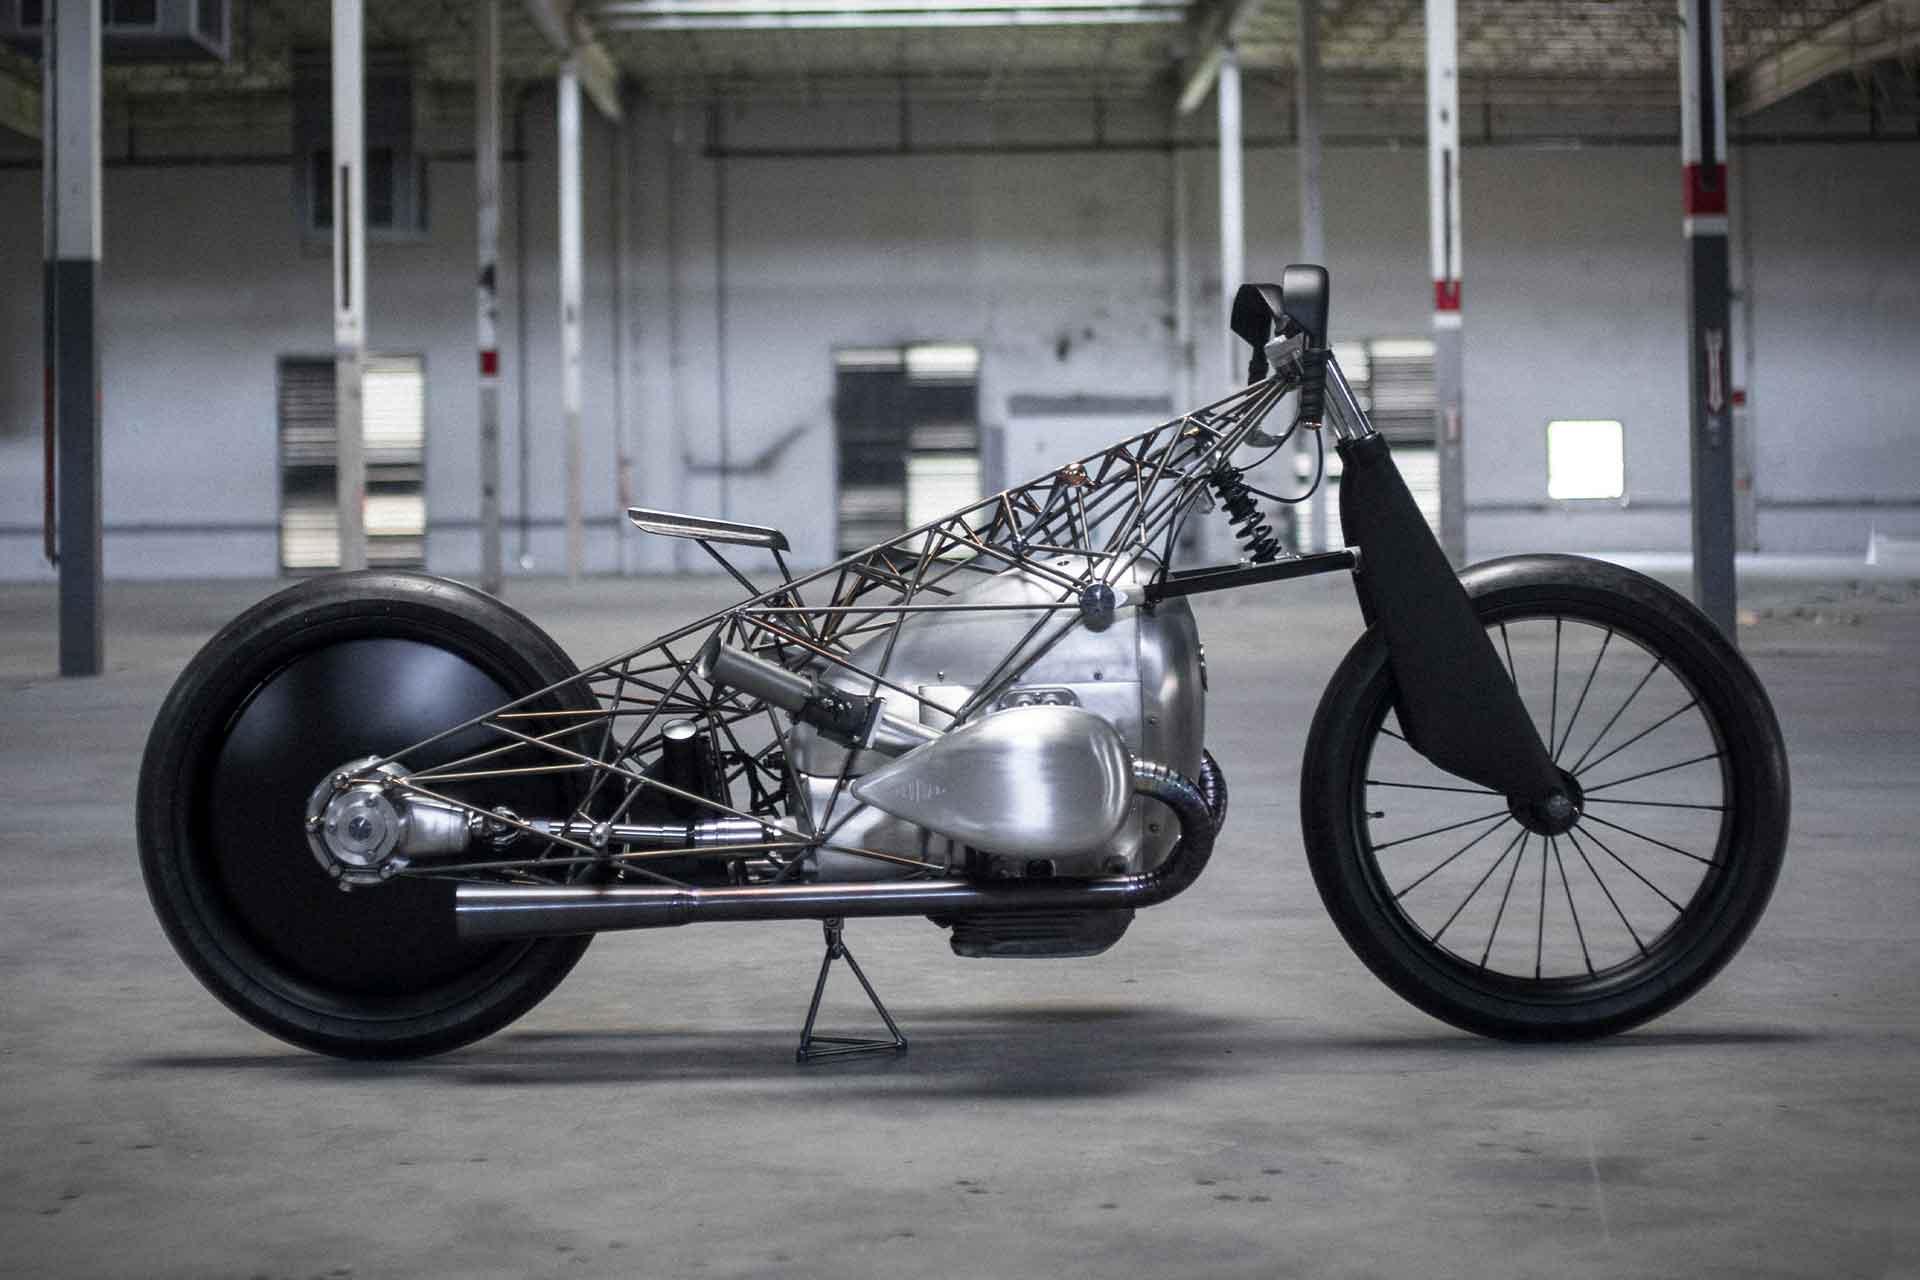 BMW x Revival Birdcage Motorcycle